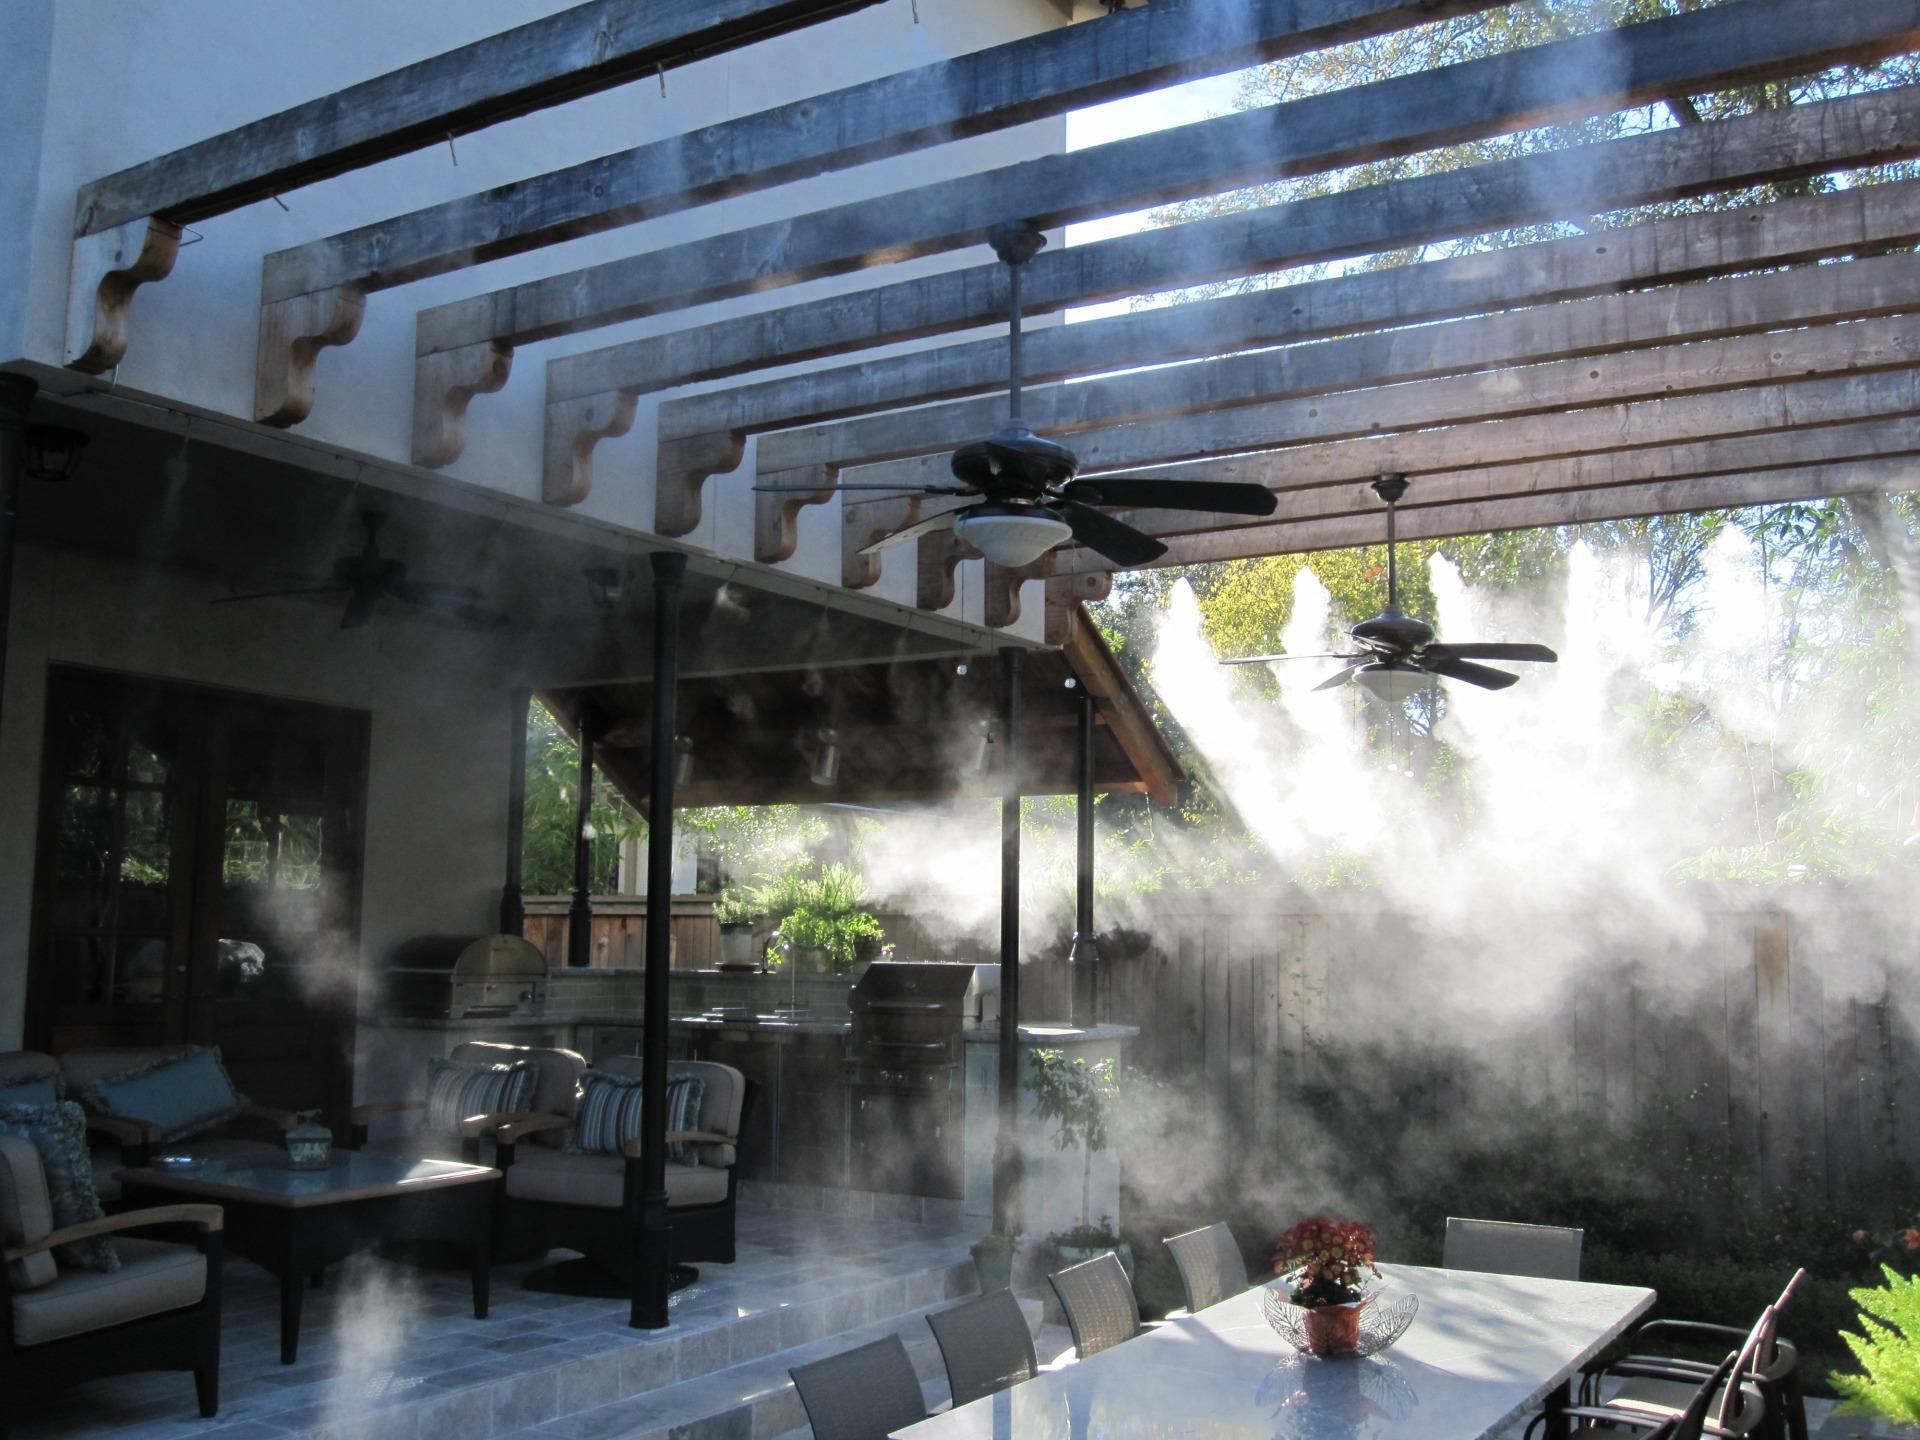 Охлаждение туманом веранд Владикавказ